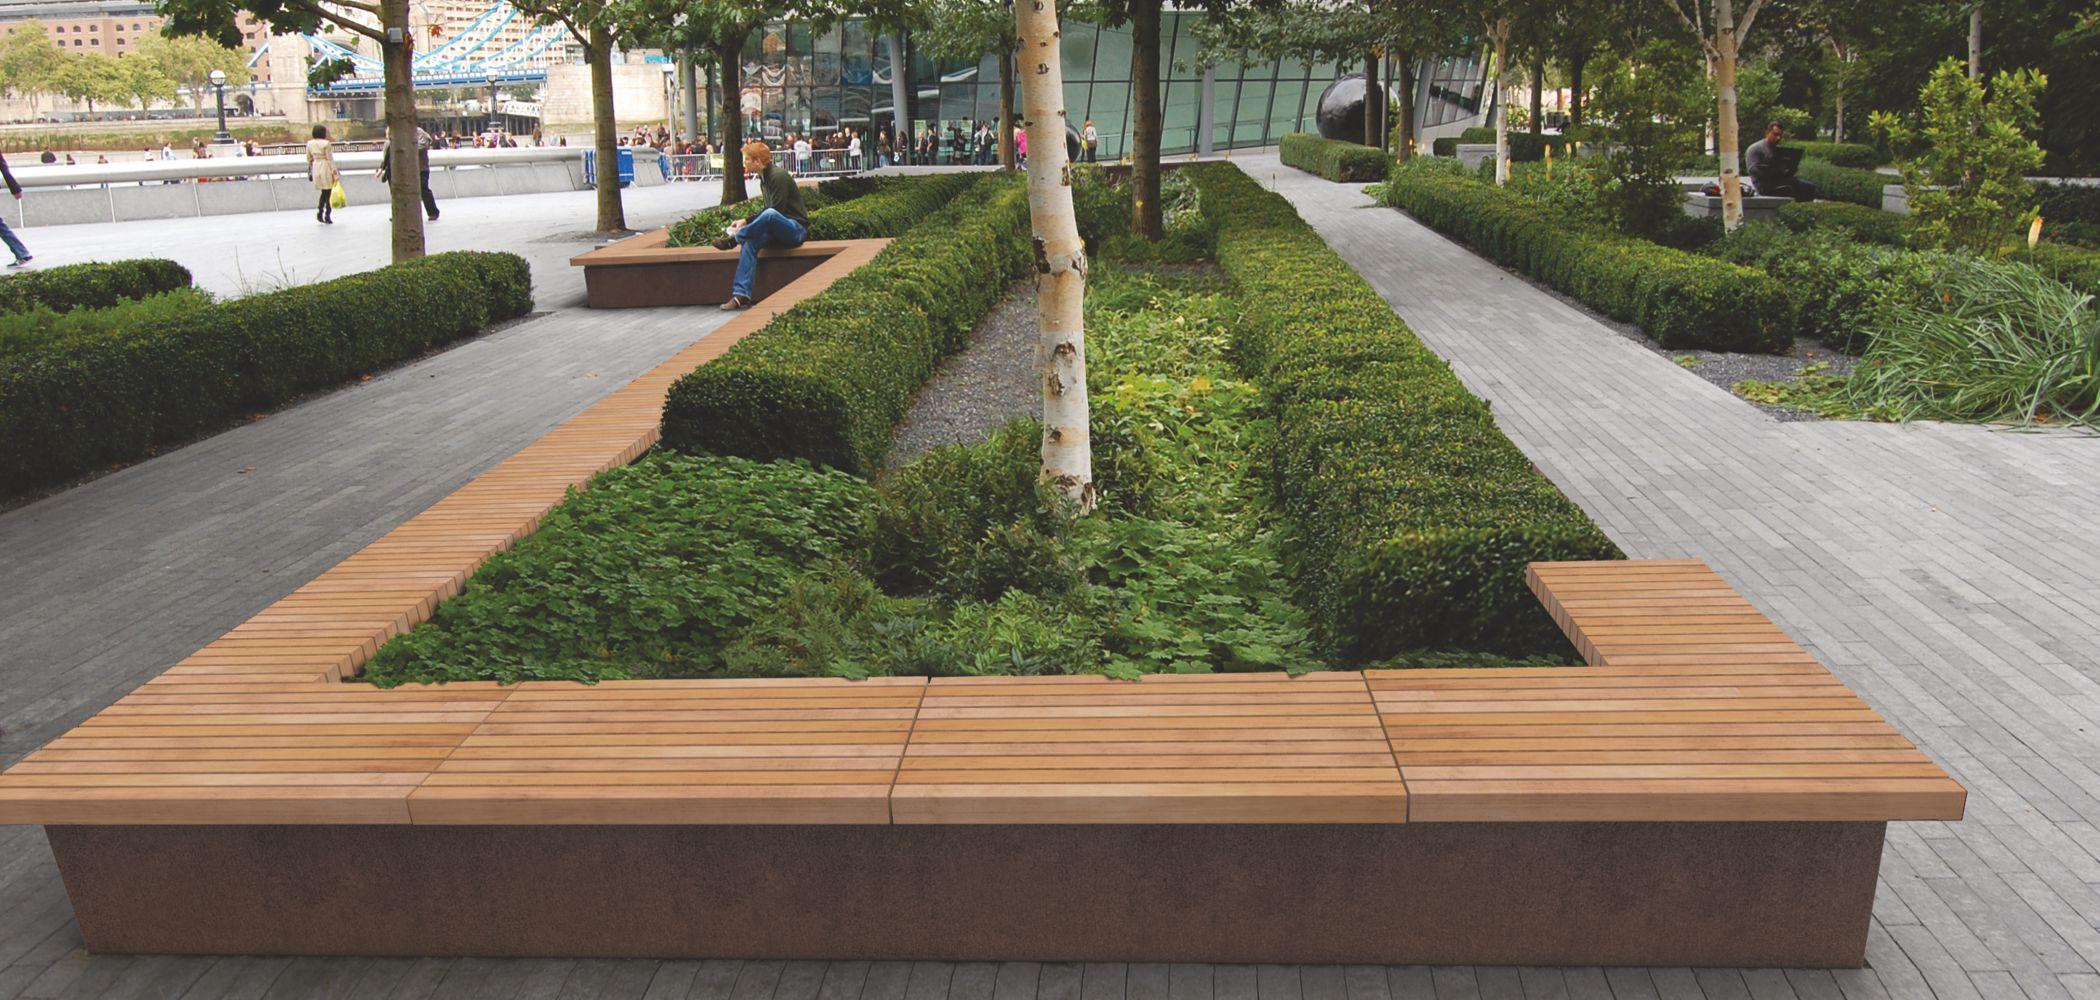 Grandifioriere Seating And Planters Metalco